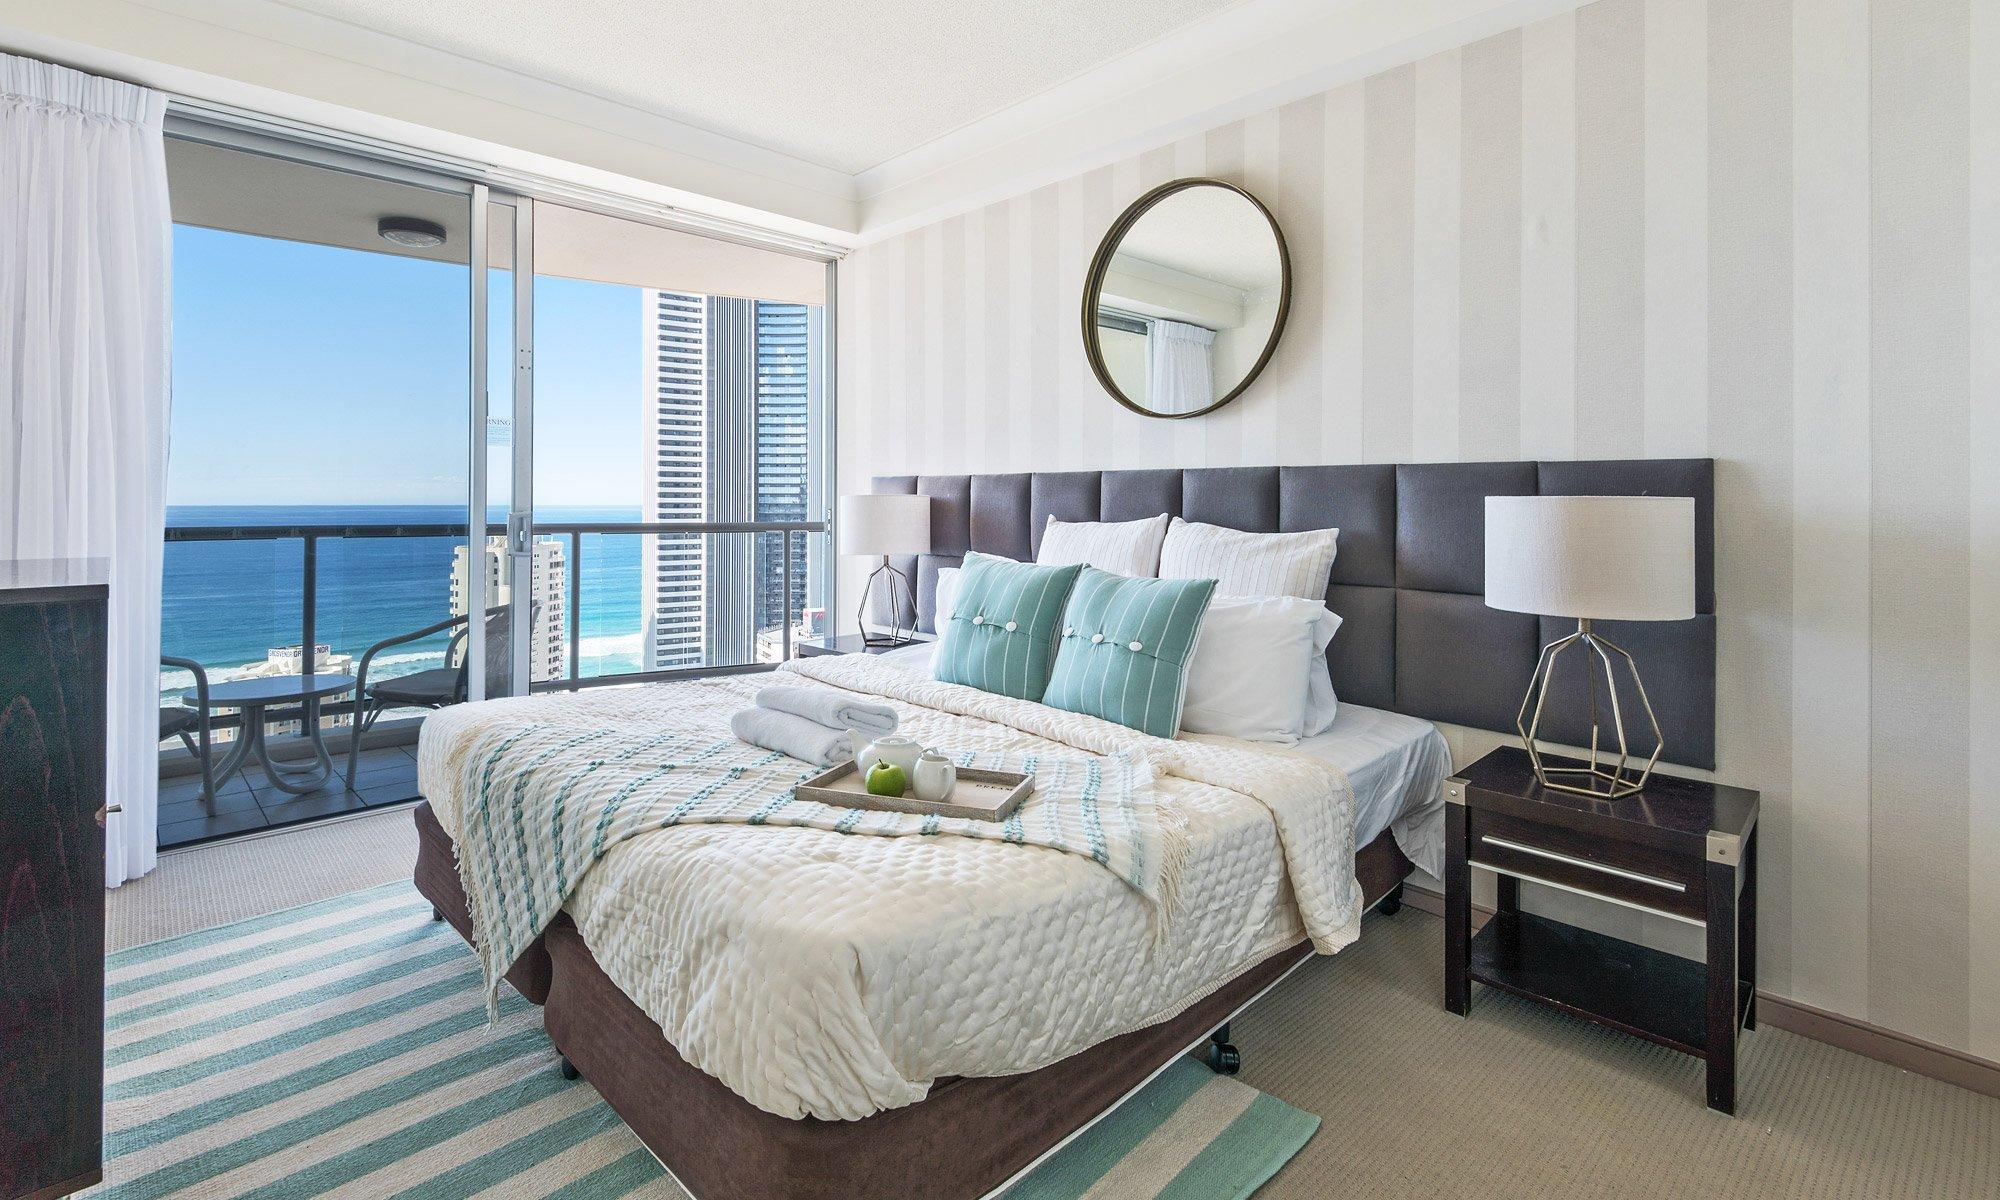 Gold Coast real estate for sale Chevron Renaissance 1264 main bedroom